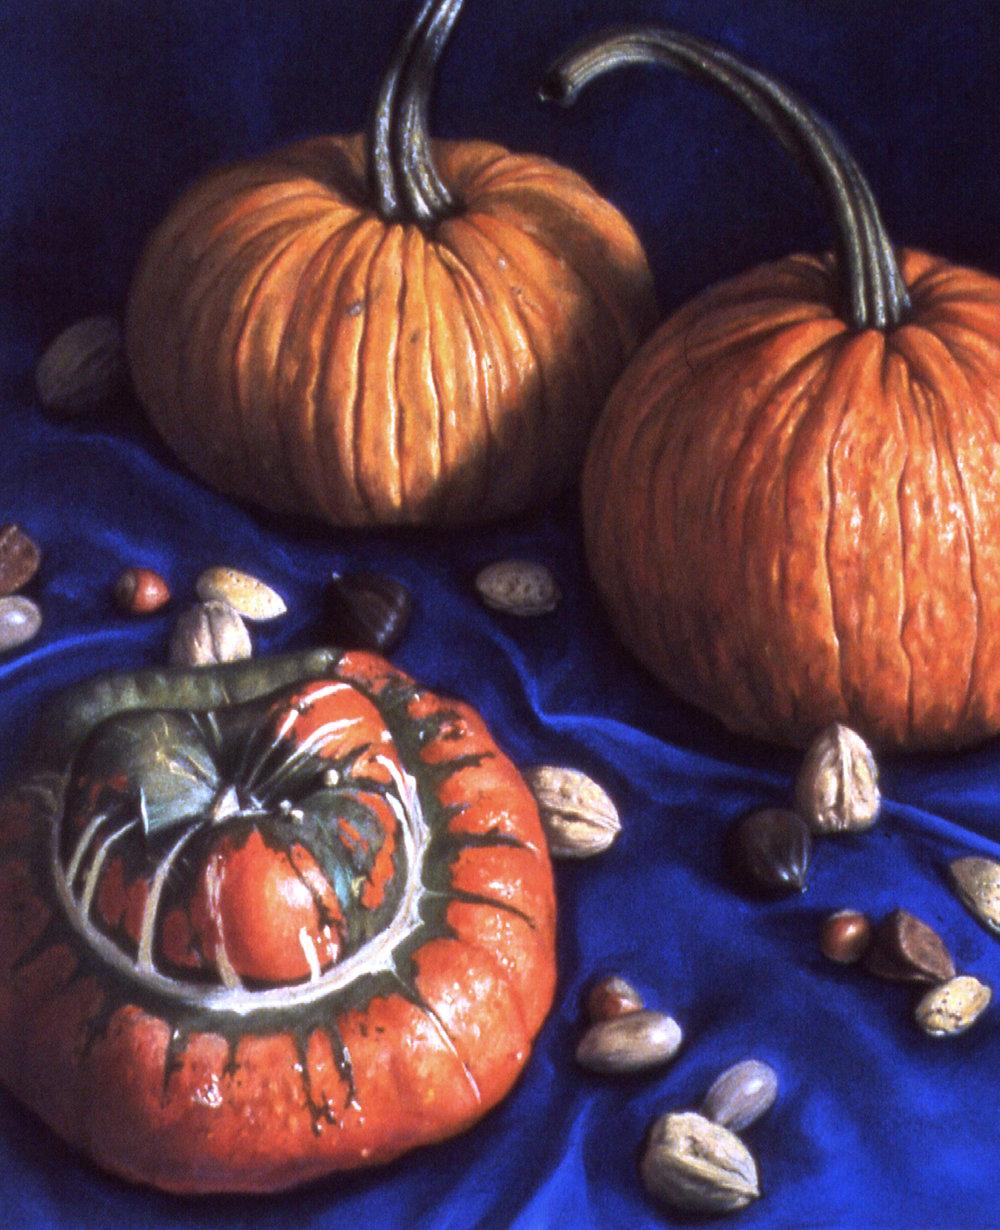 Pumpkins8X10v1_1500px.jpg